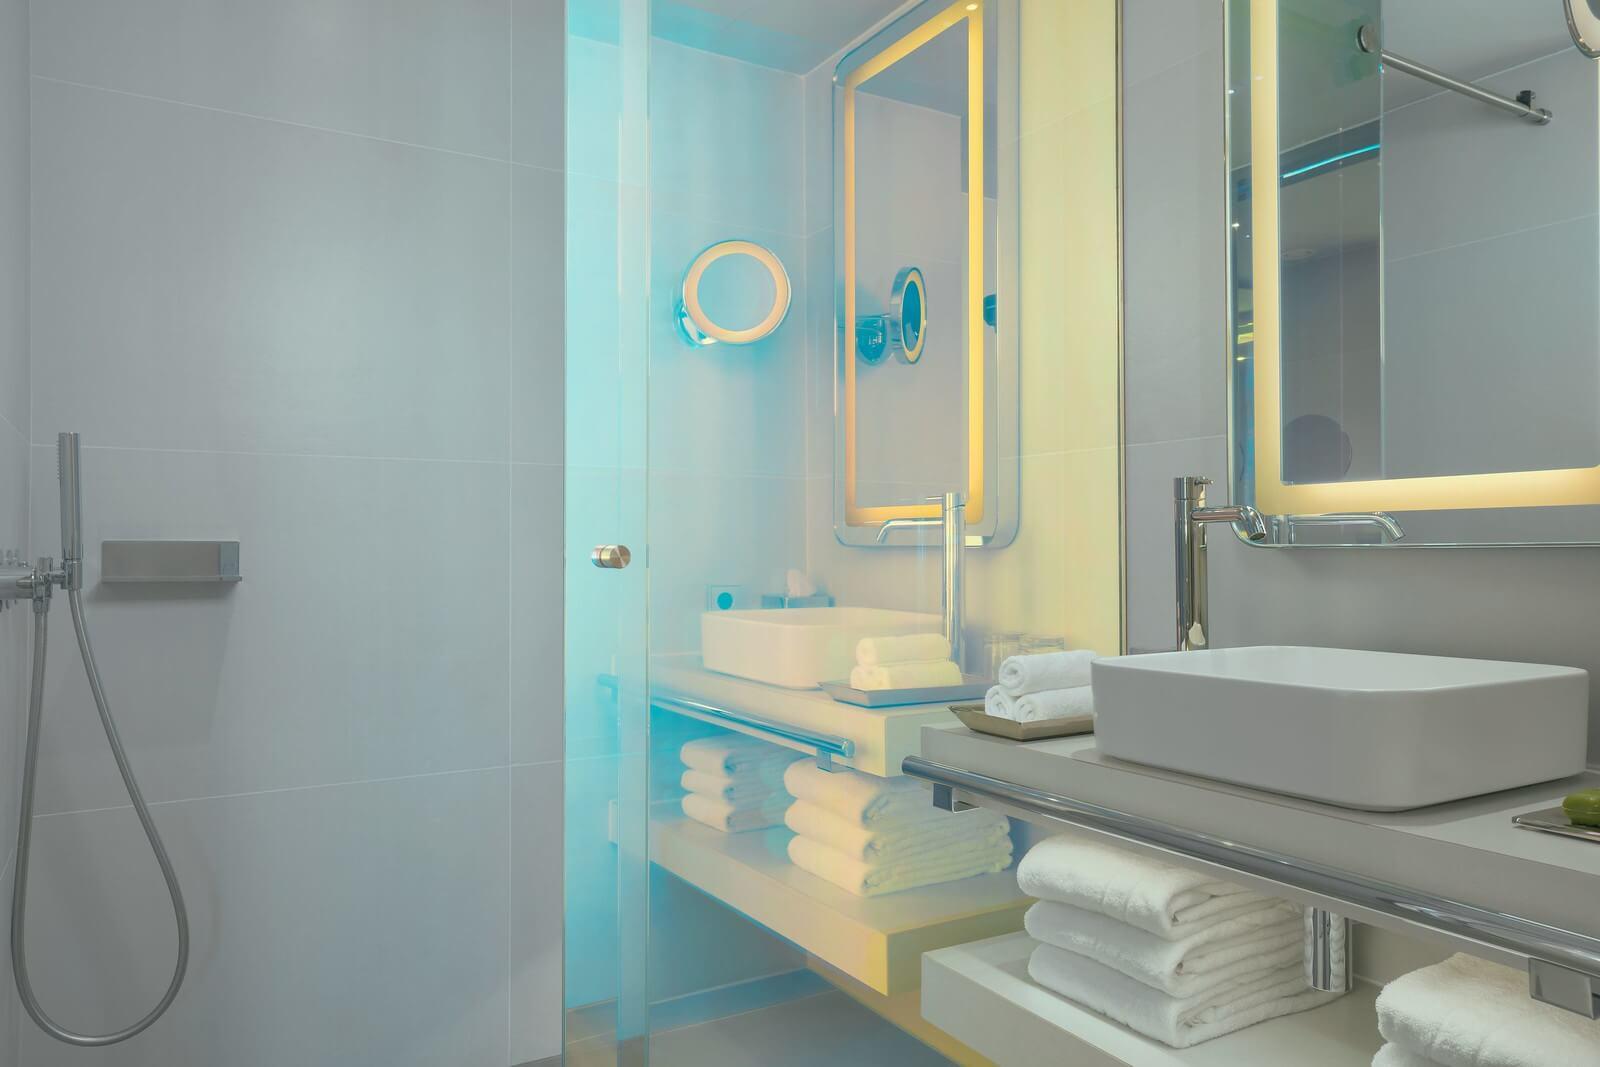 https://www.white-ibiza.com/wp-content/uploads/2020/08/ibiza-hotels-w-ibiza-2020-10.jpg